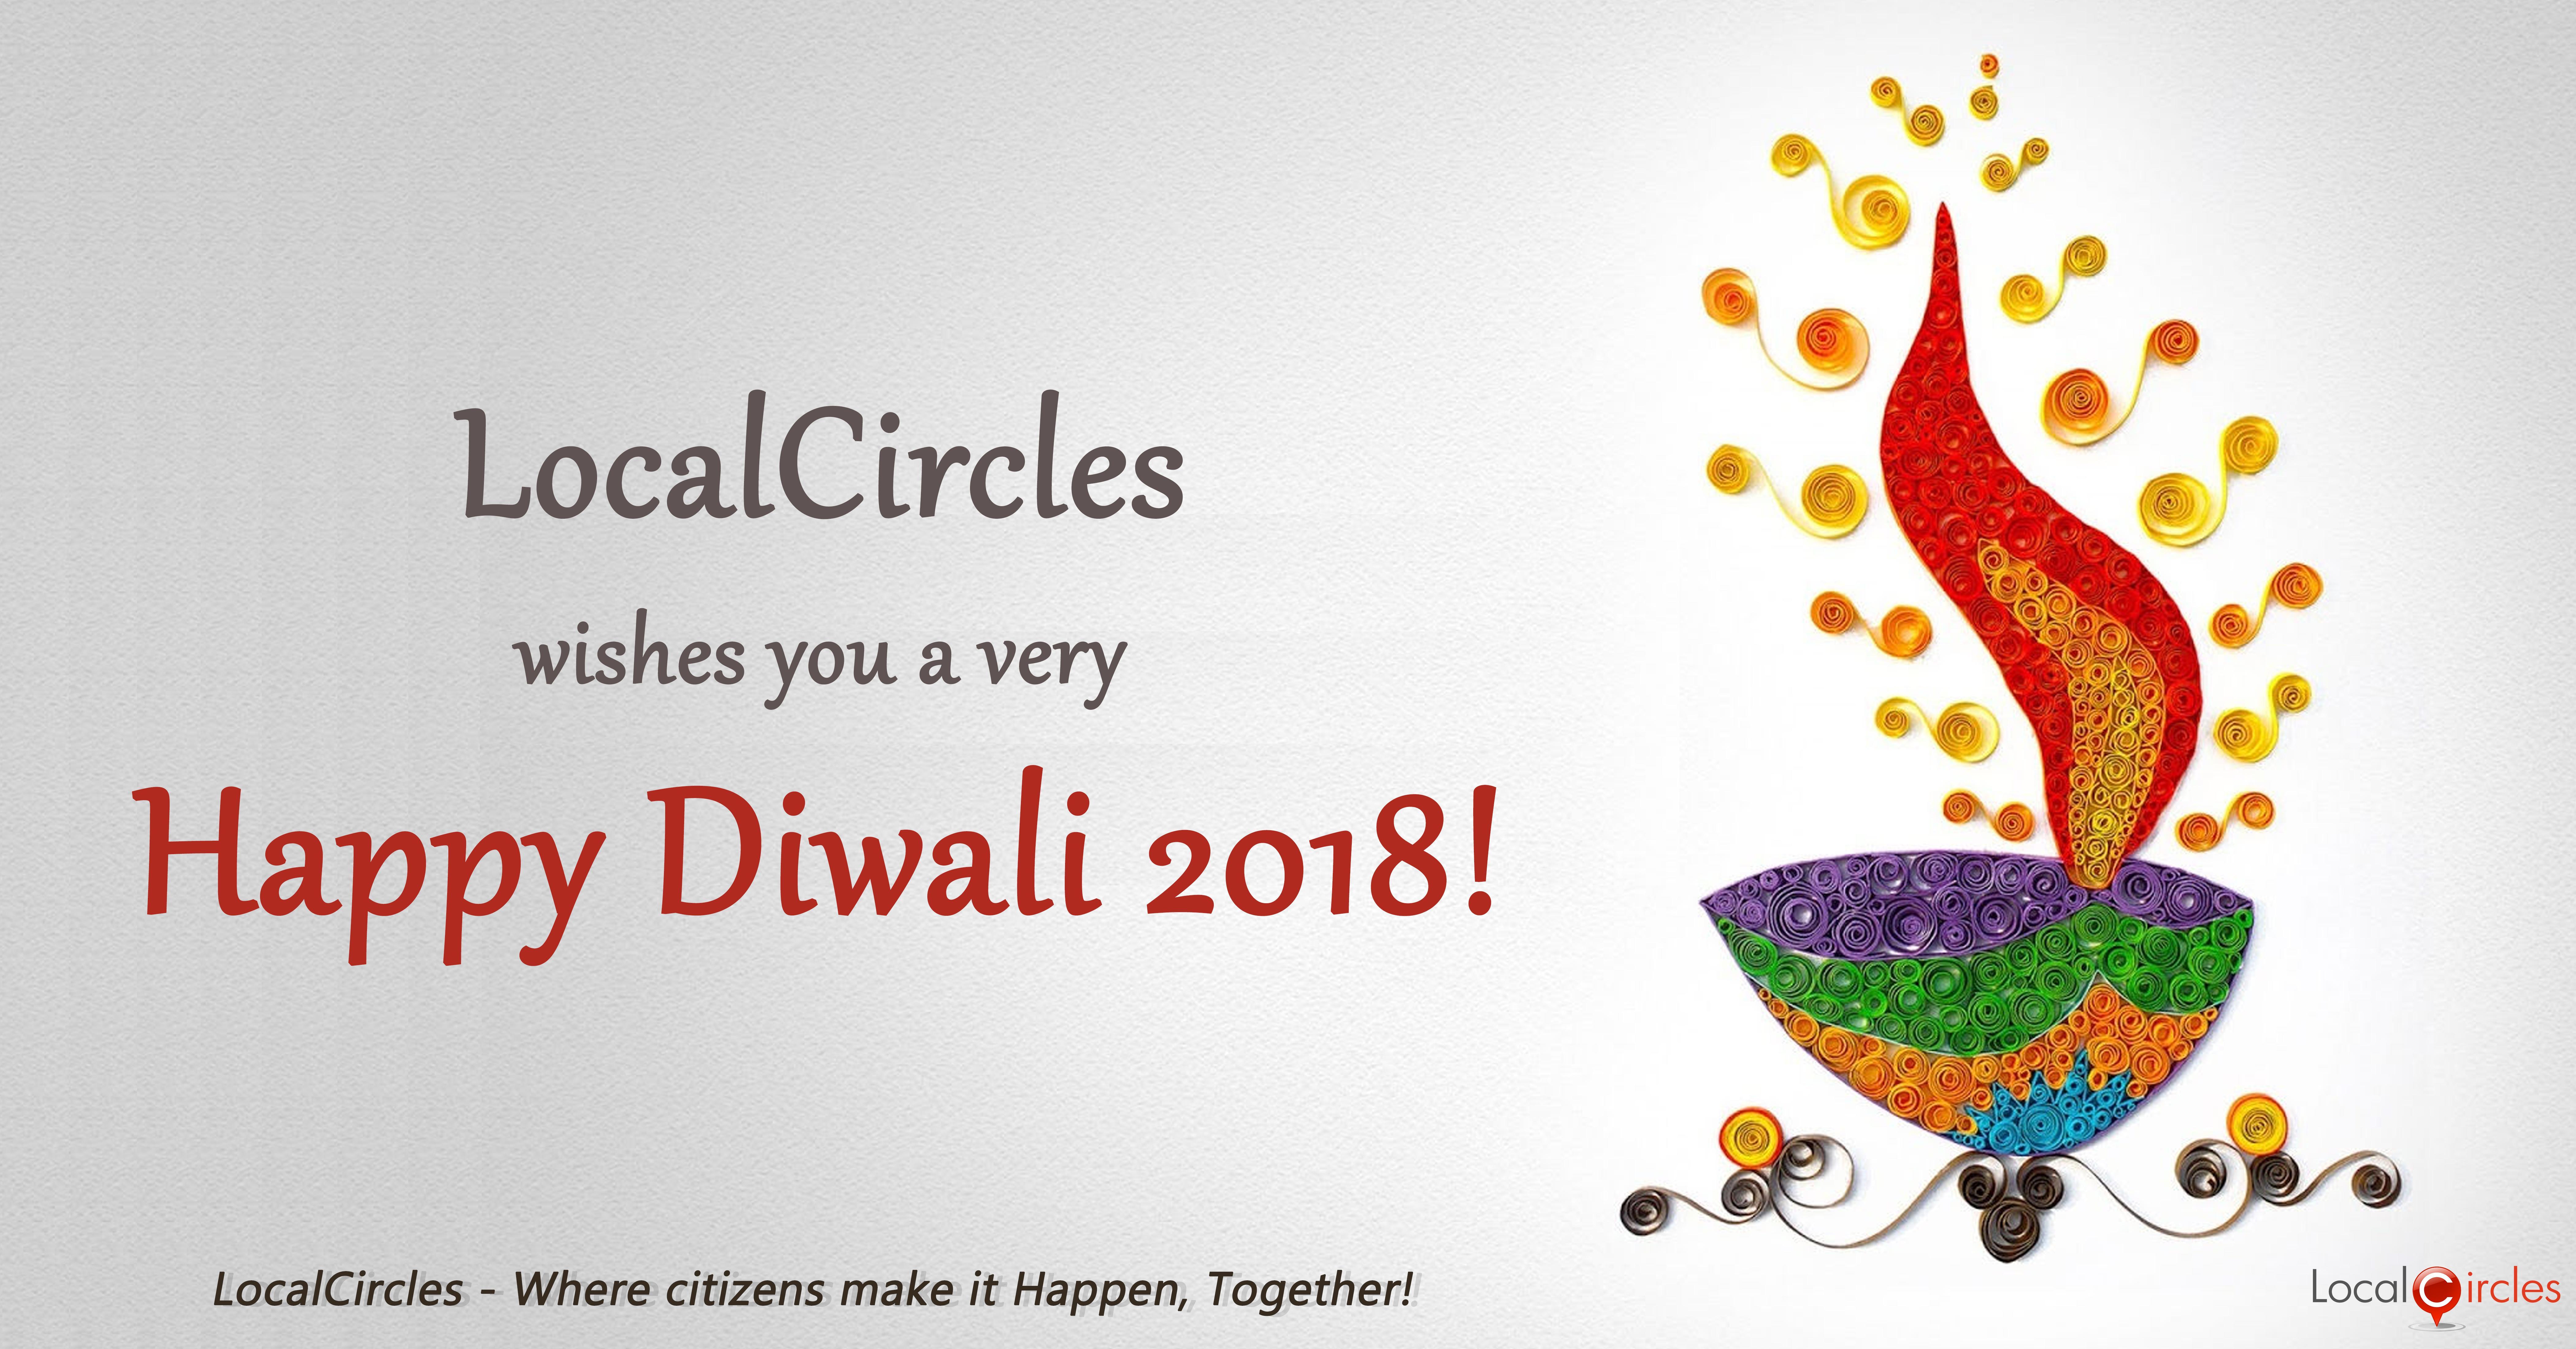 Happy_Diwali_2018_-_1_-_v2___20181107125845___.jpg